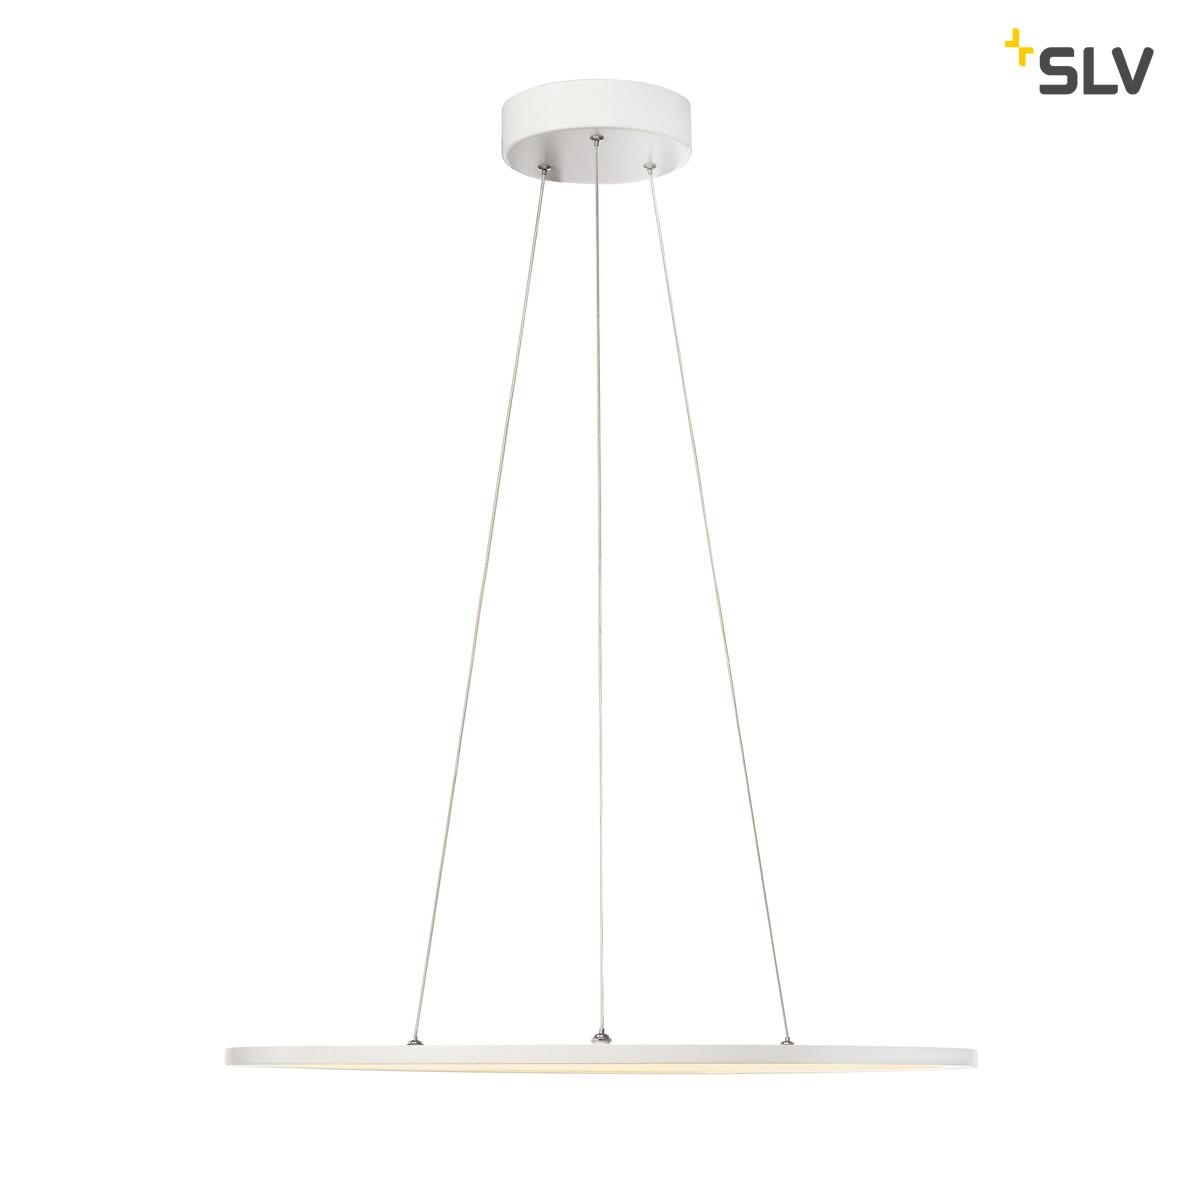 SLV LED Panel Pendelleuchte, 2700°K, weiß